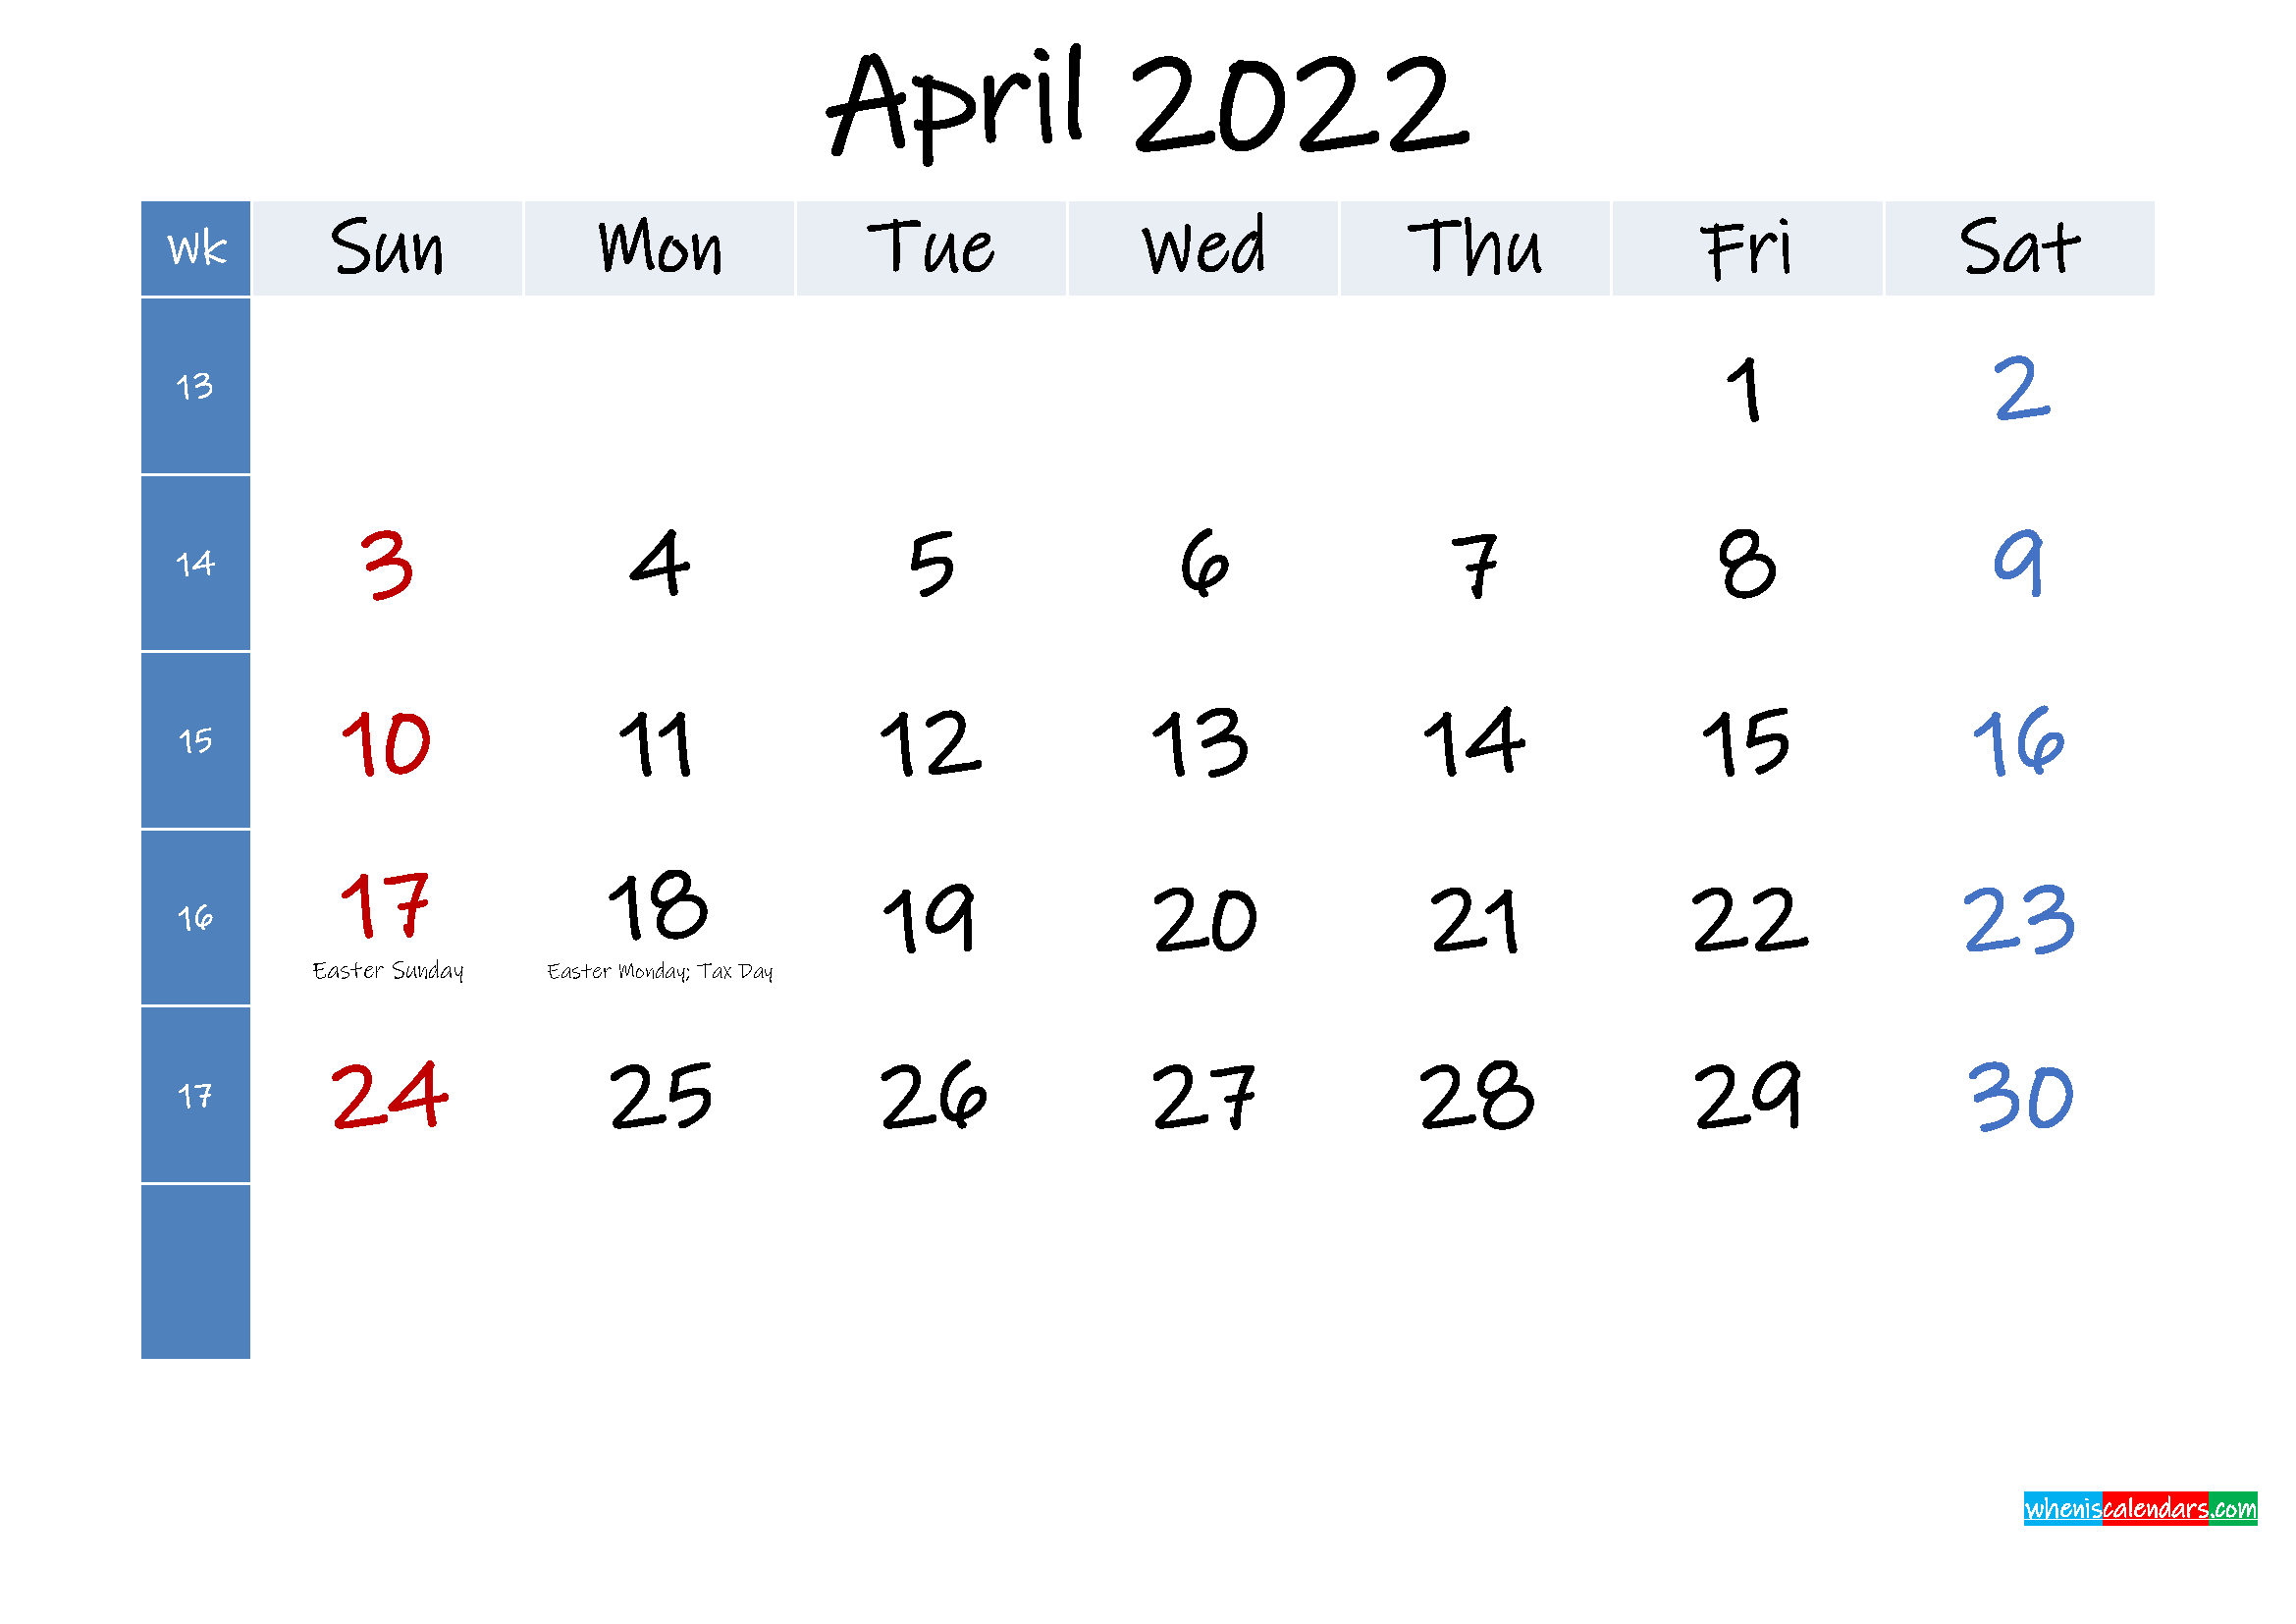 April 2022 Free Printable Calendar with Holidays